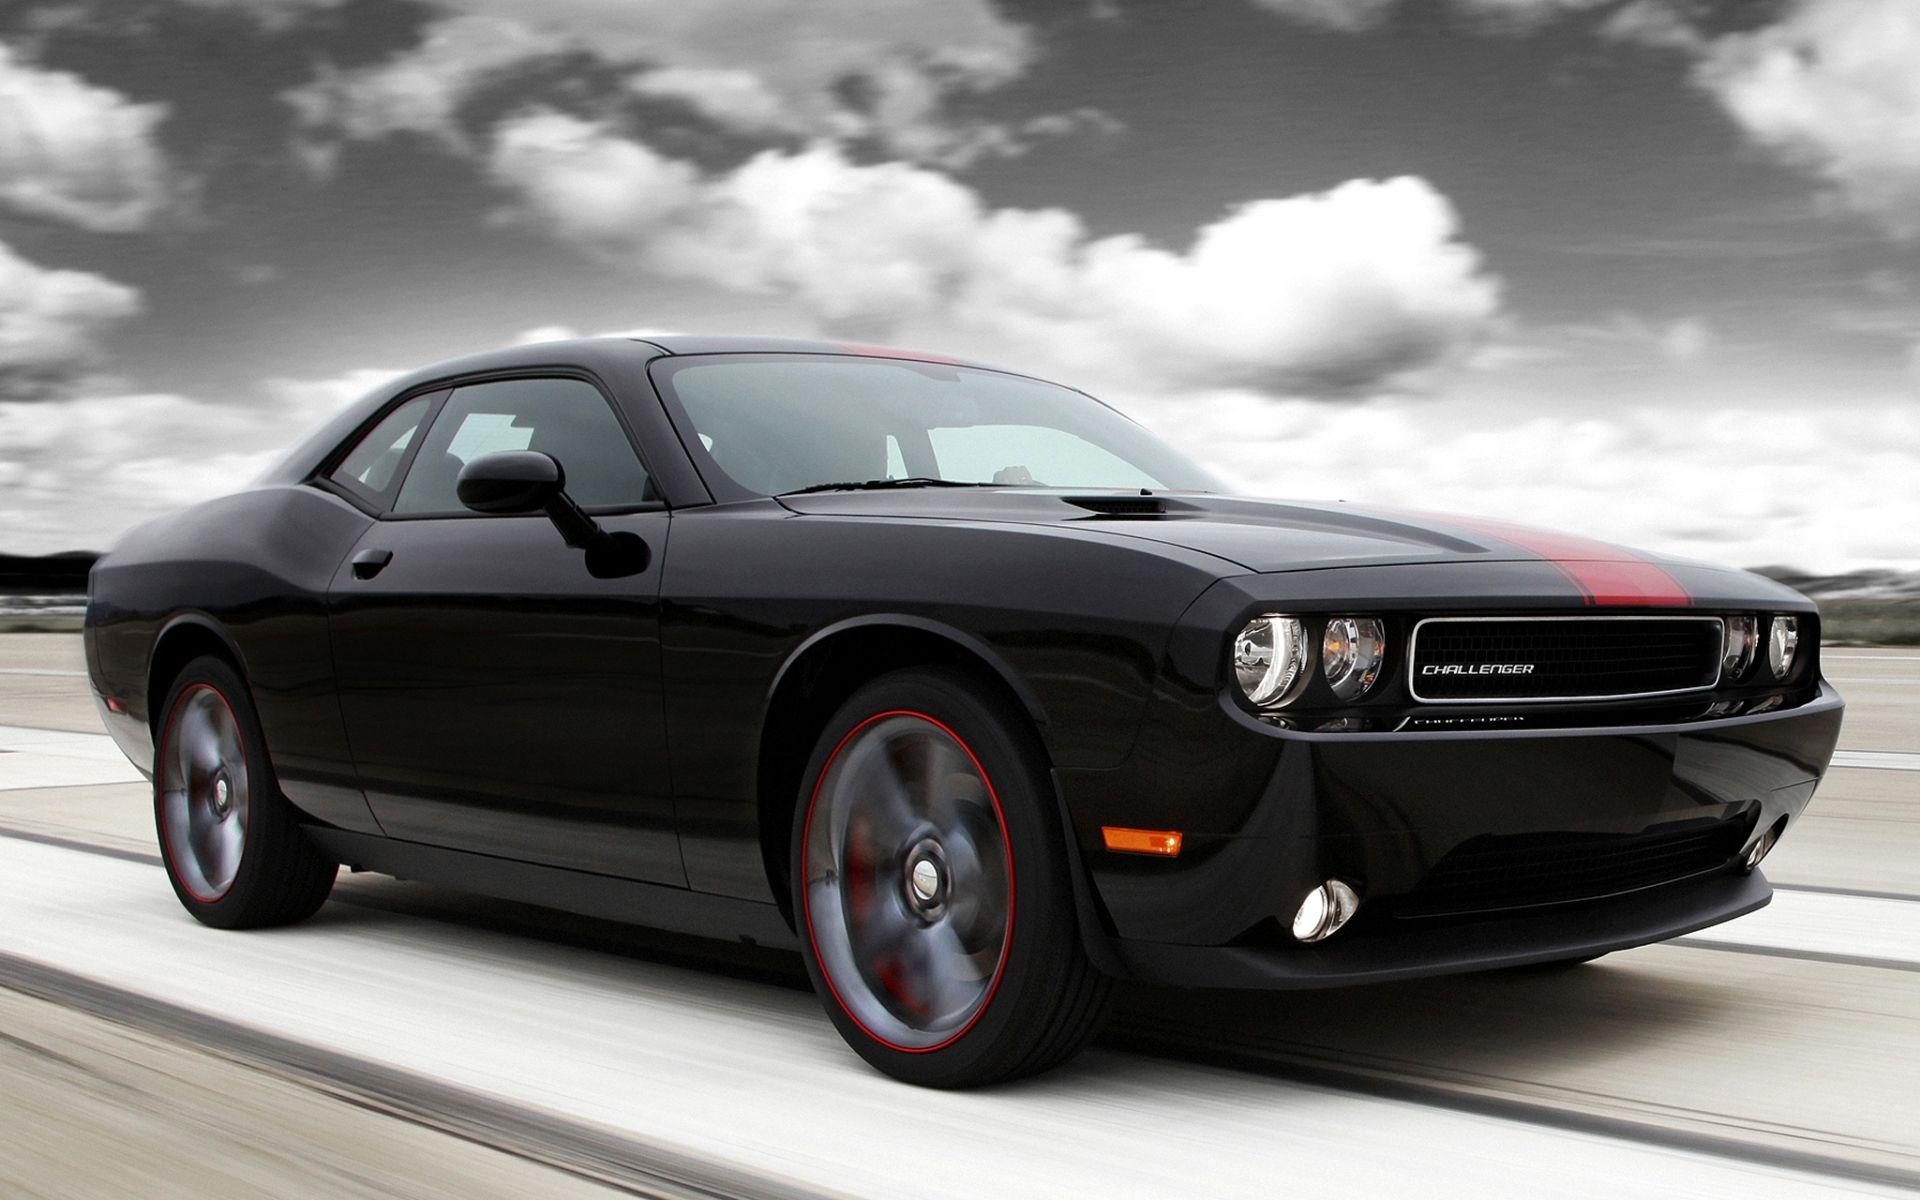 Black Dodge Charger Wallpaper Full Hd Pictures Automobiles Desktop Lf